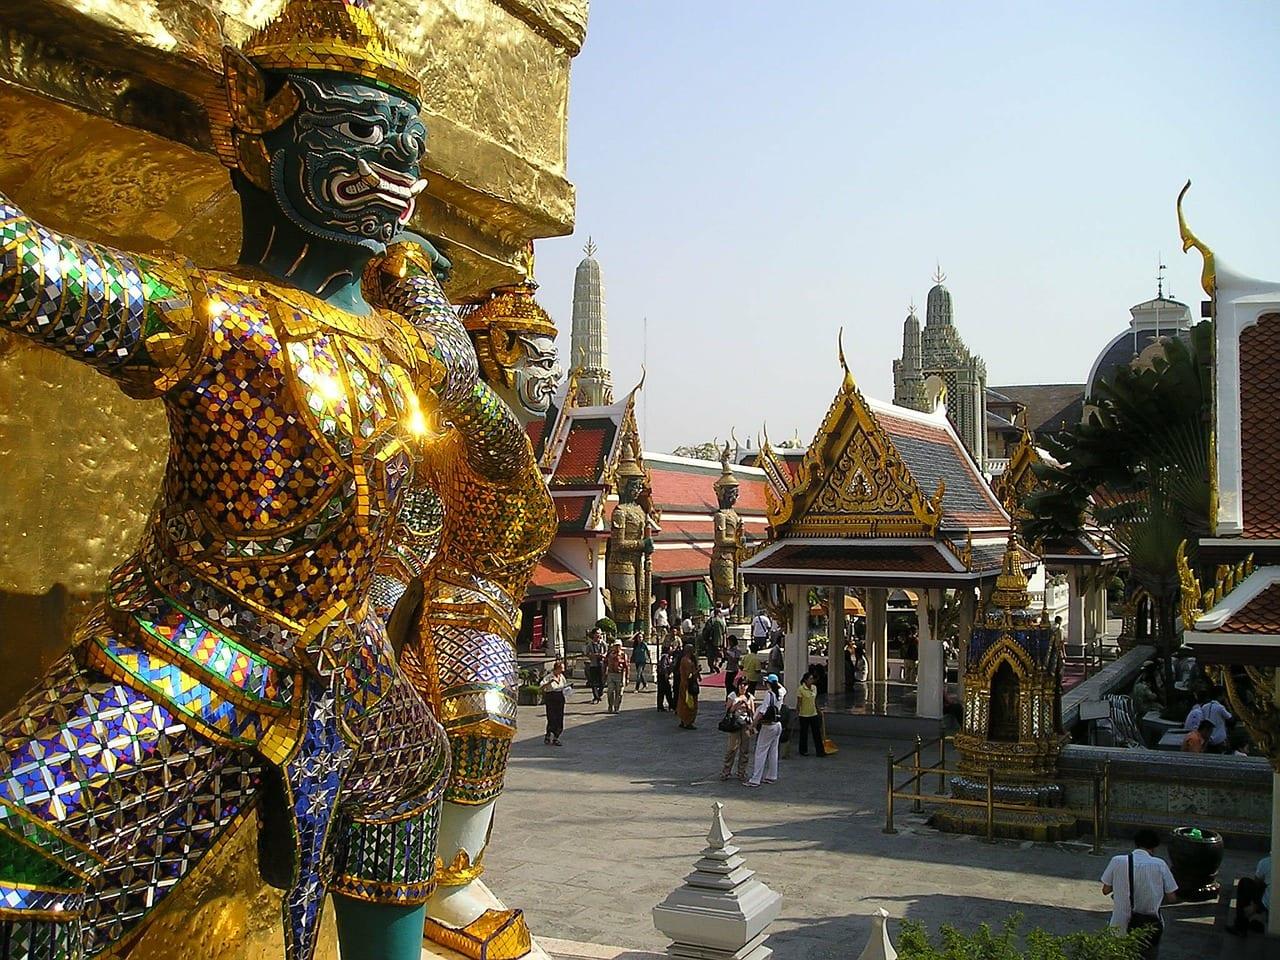 Visit the Grand Palace during your 2 day Bangkok itinerary.